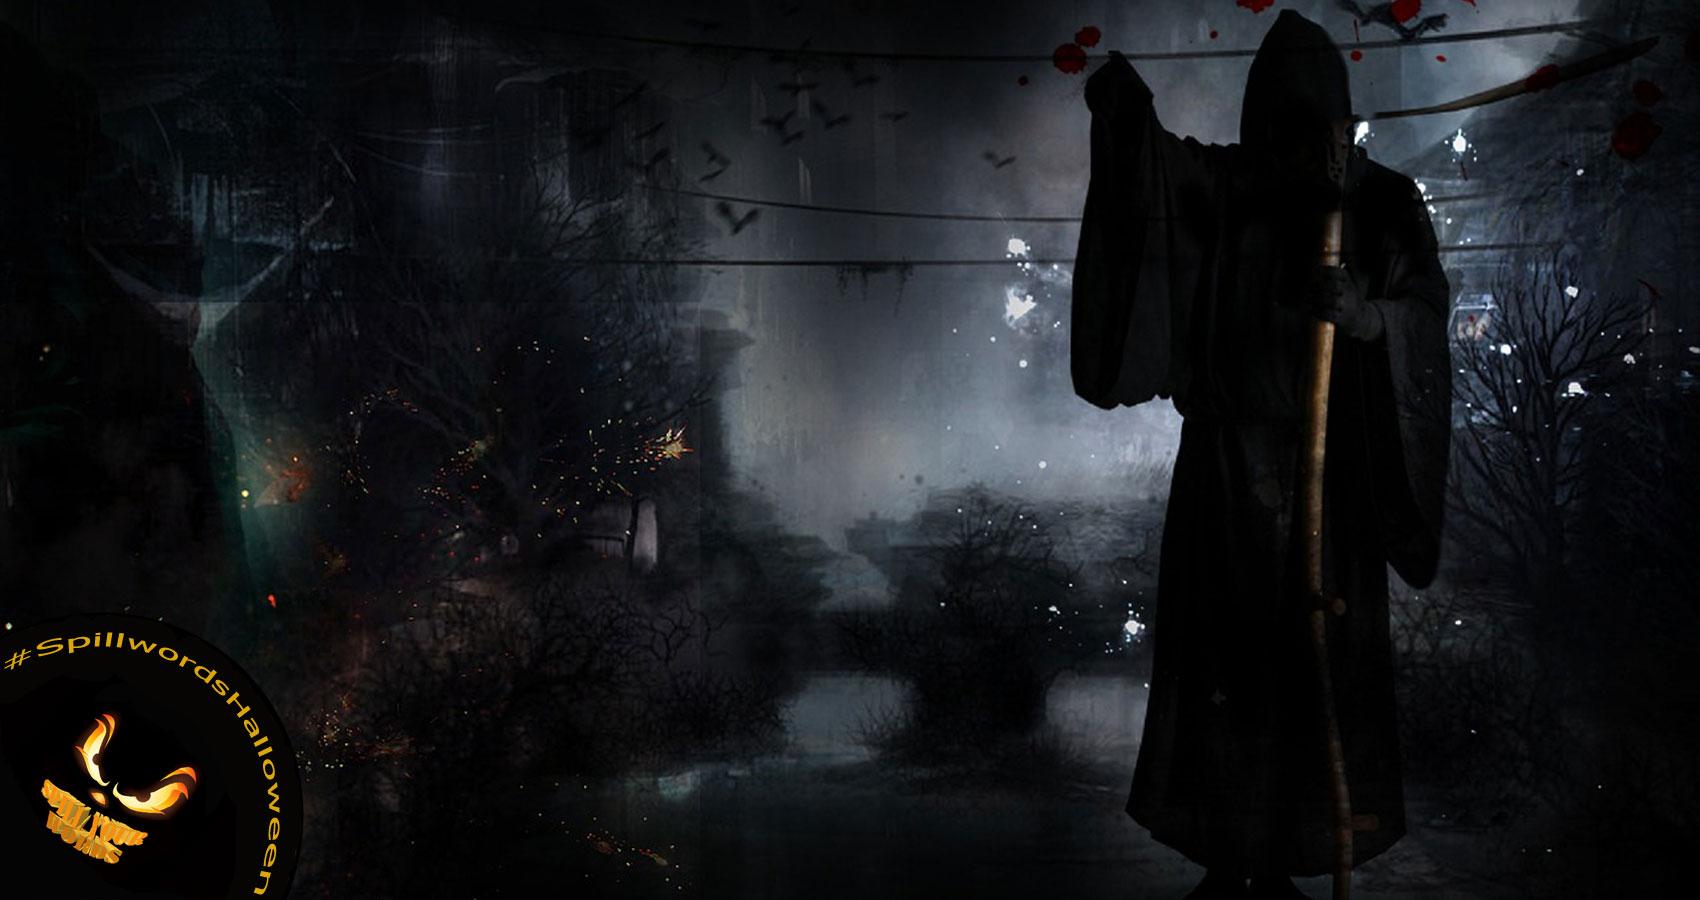 Grim Reaper, written by Verona Jones at Spillwords.com